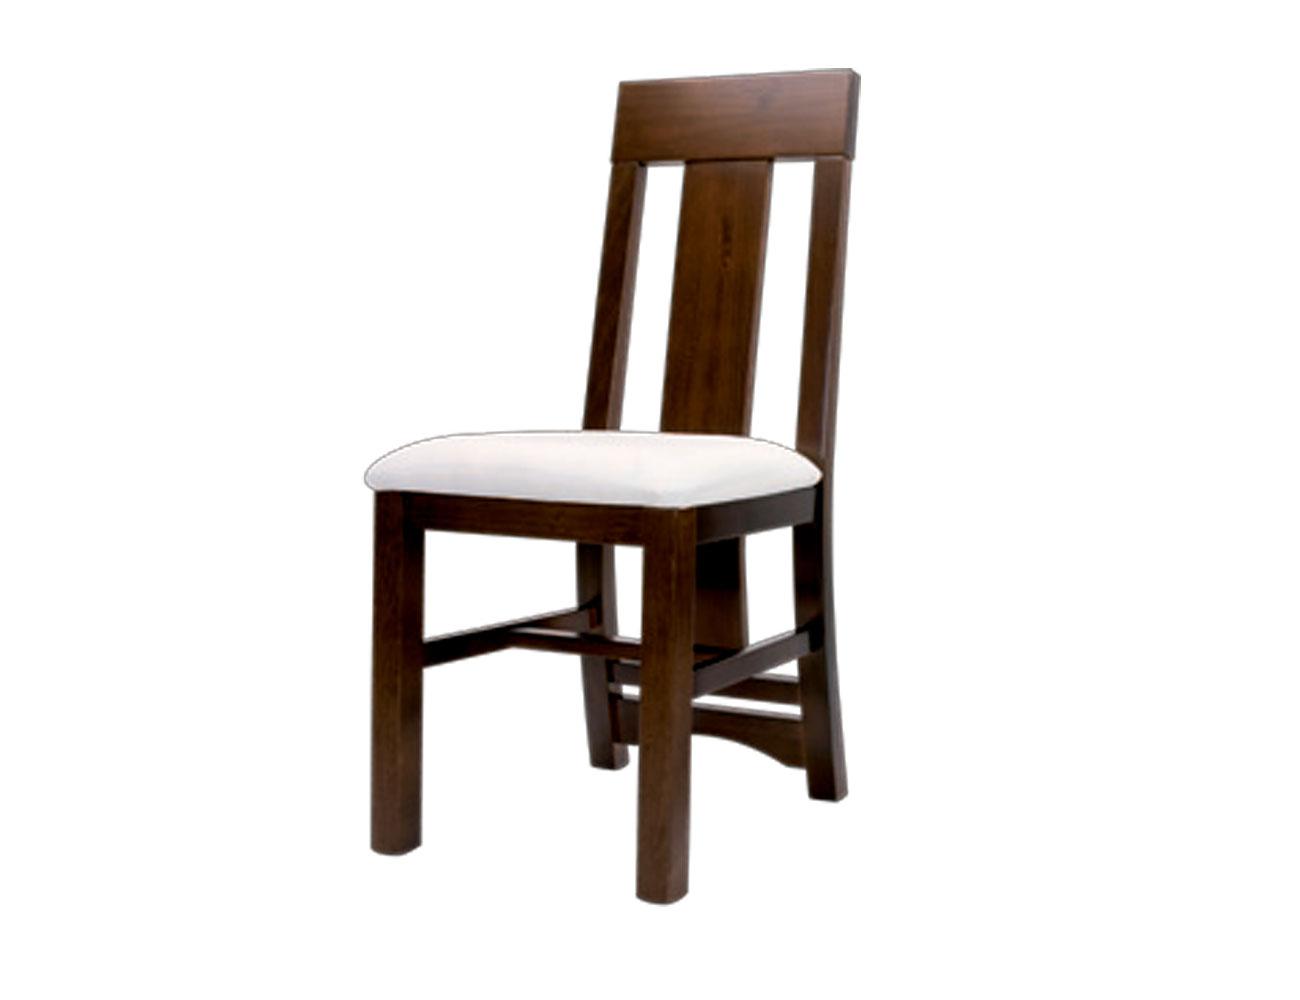 C0 51 silla madera tapizada4